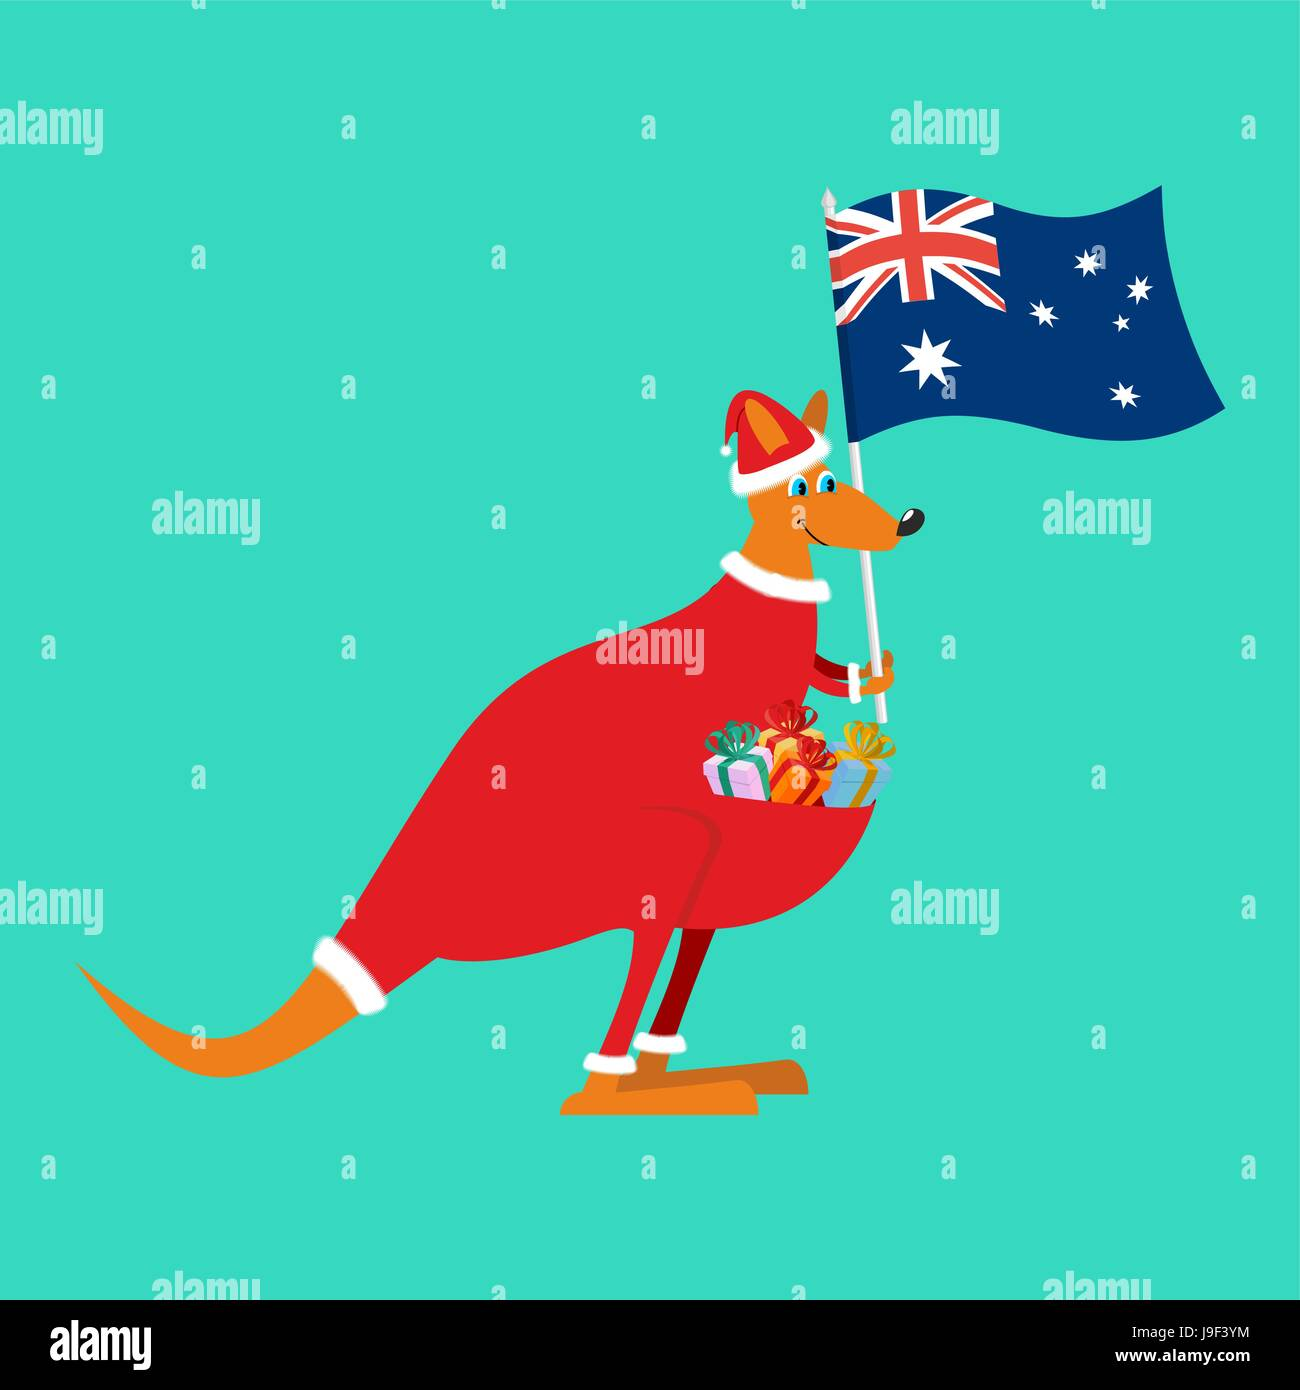 Christmas Kangaroo Cartoon.Santa Australia Australian Kangaroo Claus Wallaby In